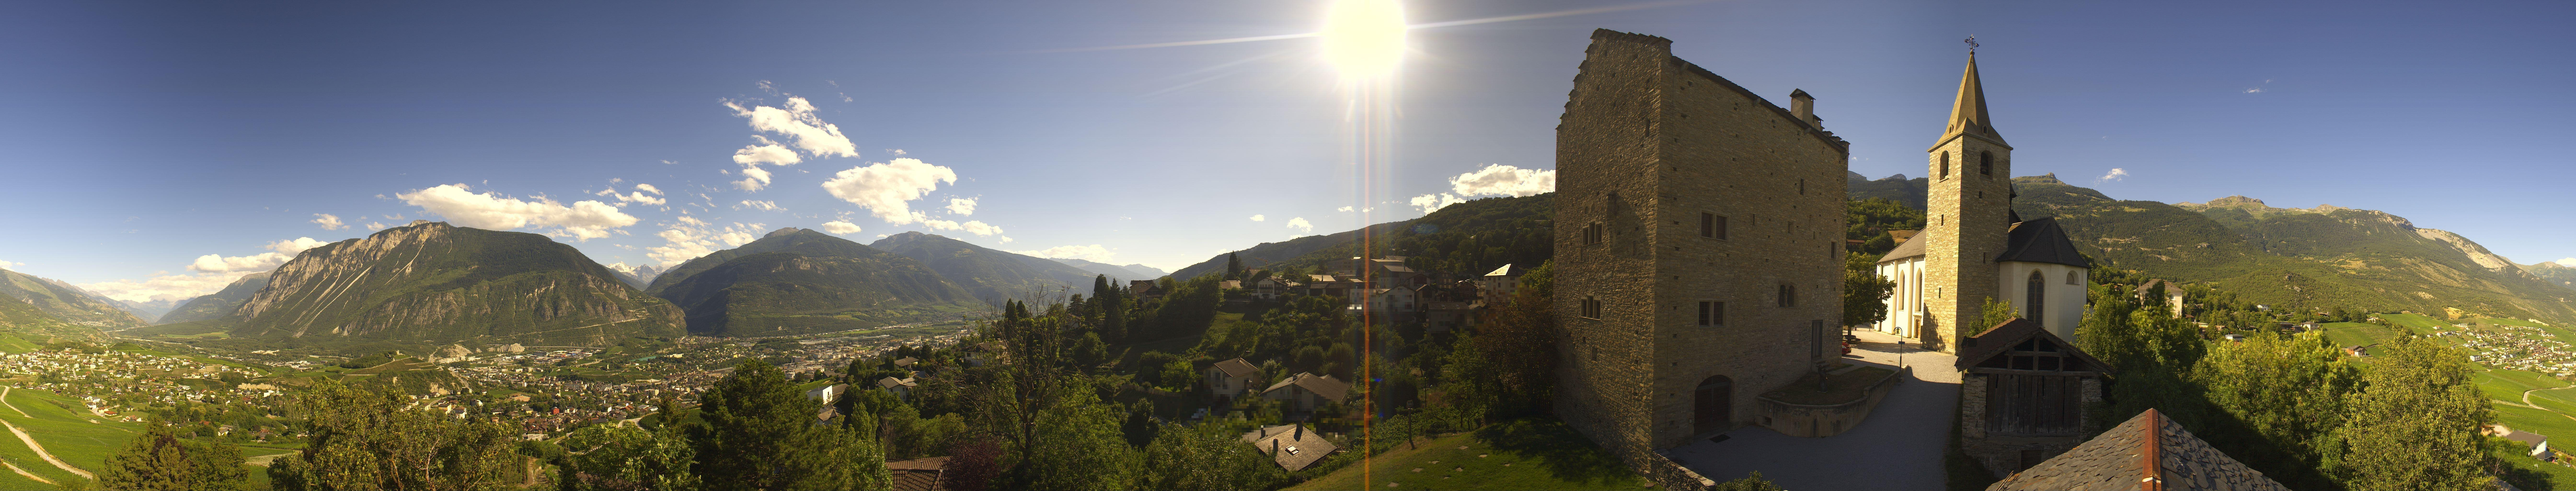 Venthône: Sierre - Salquenen - Val d'Anniviers